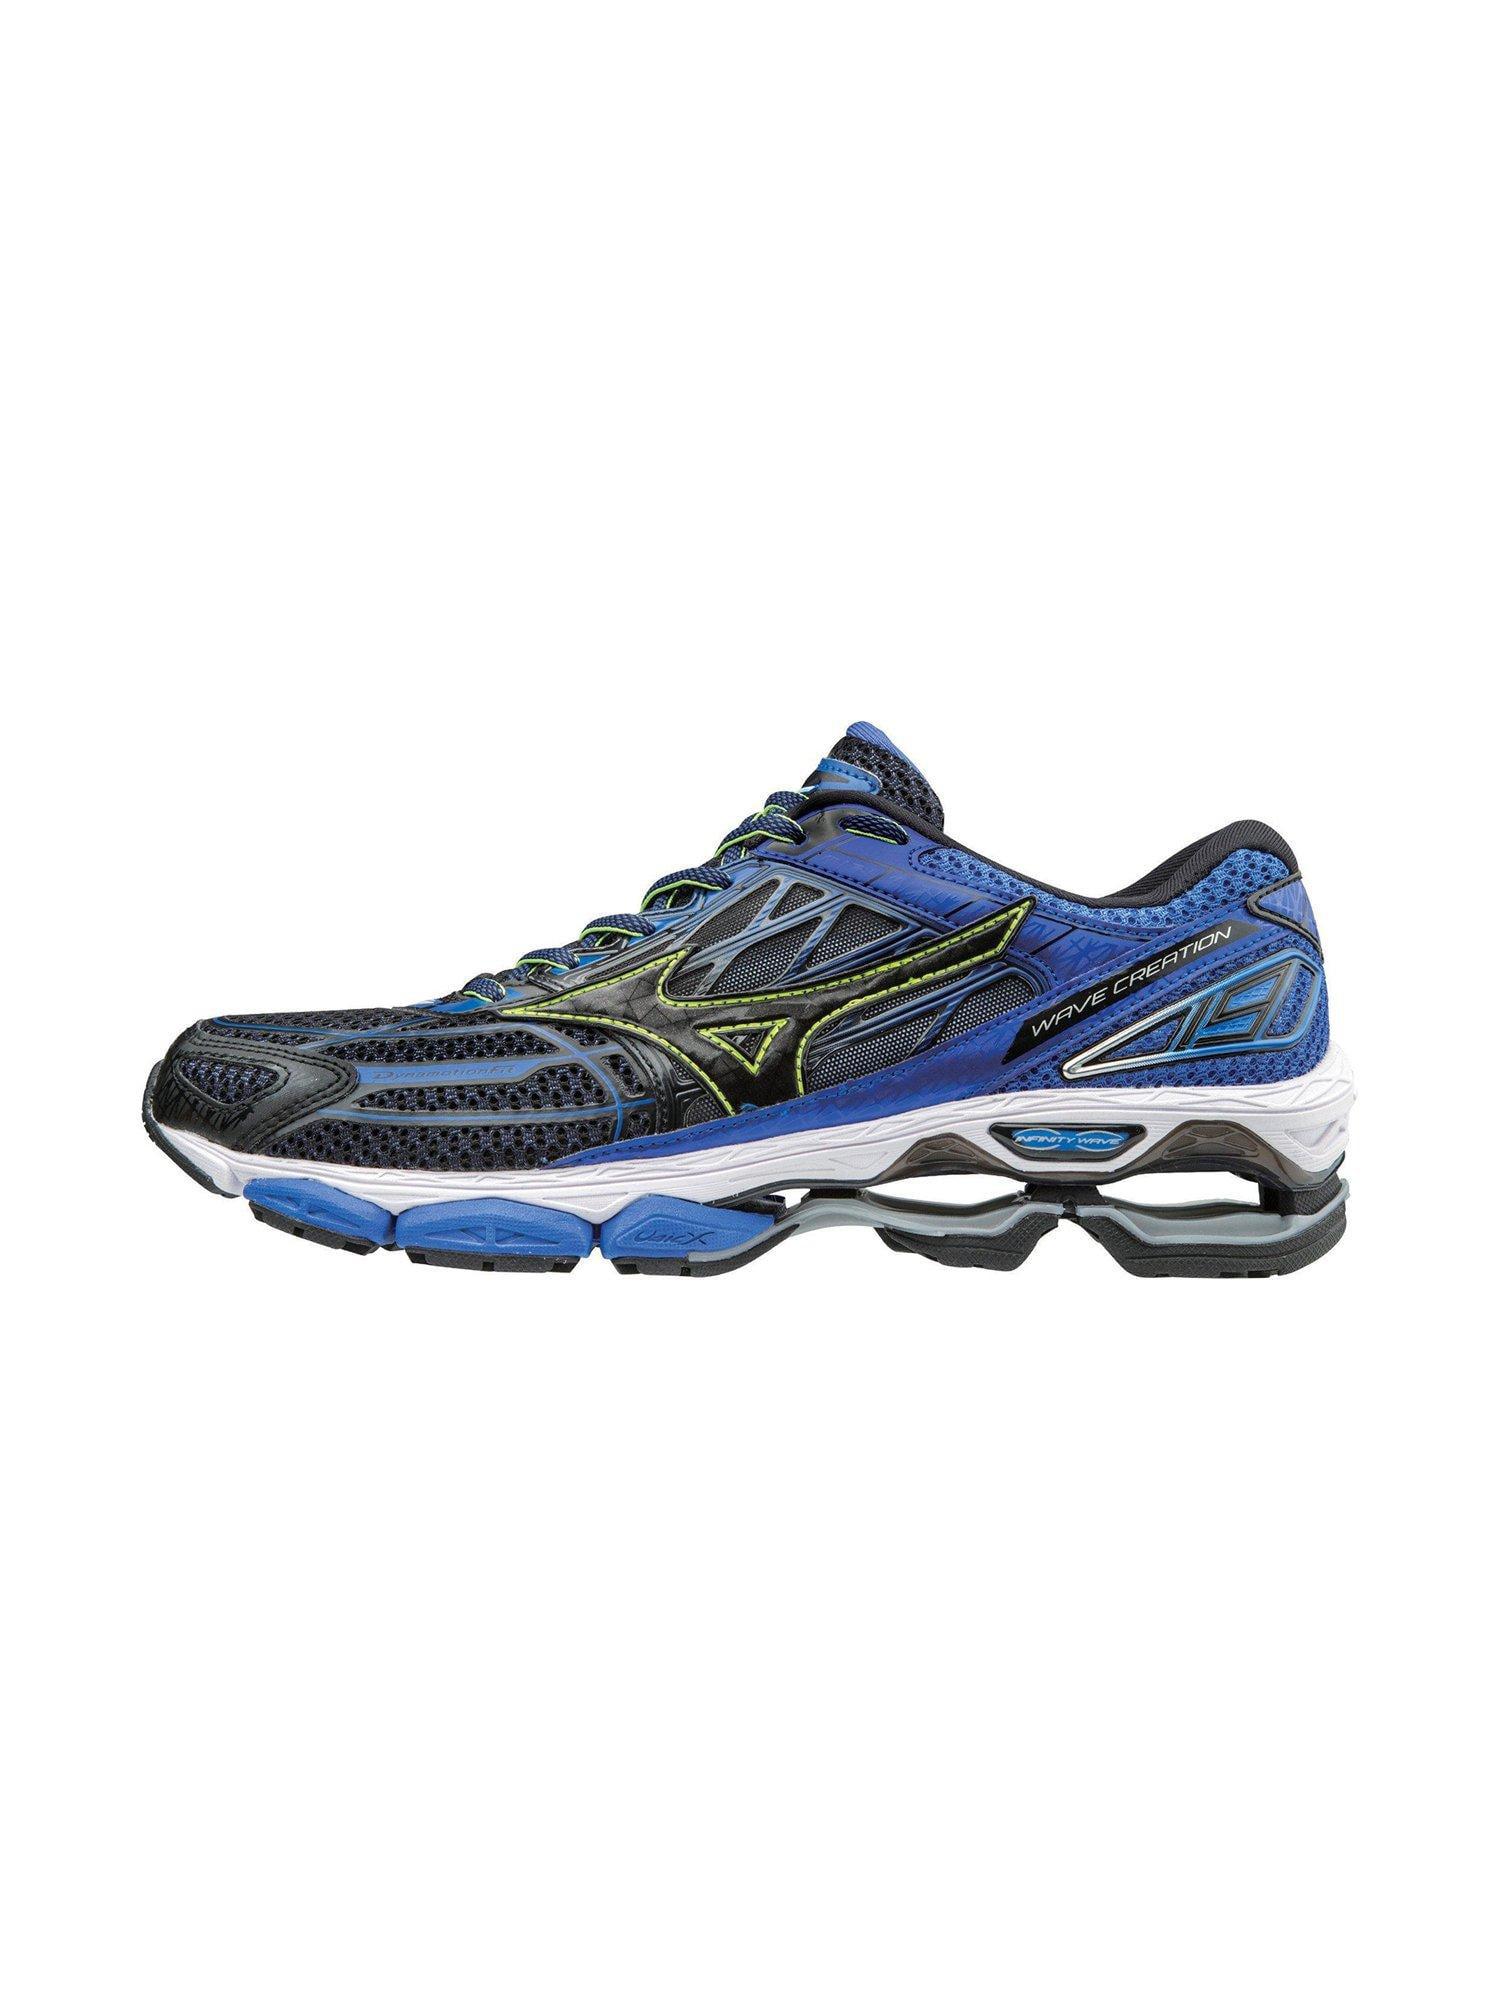 Mizuno - Mizuno Mens Running Shoes - Men s Wave Creation 19 - 410944 -  Walmart.com 9dc5fde37d2